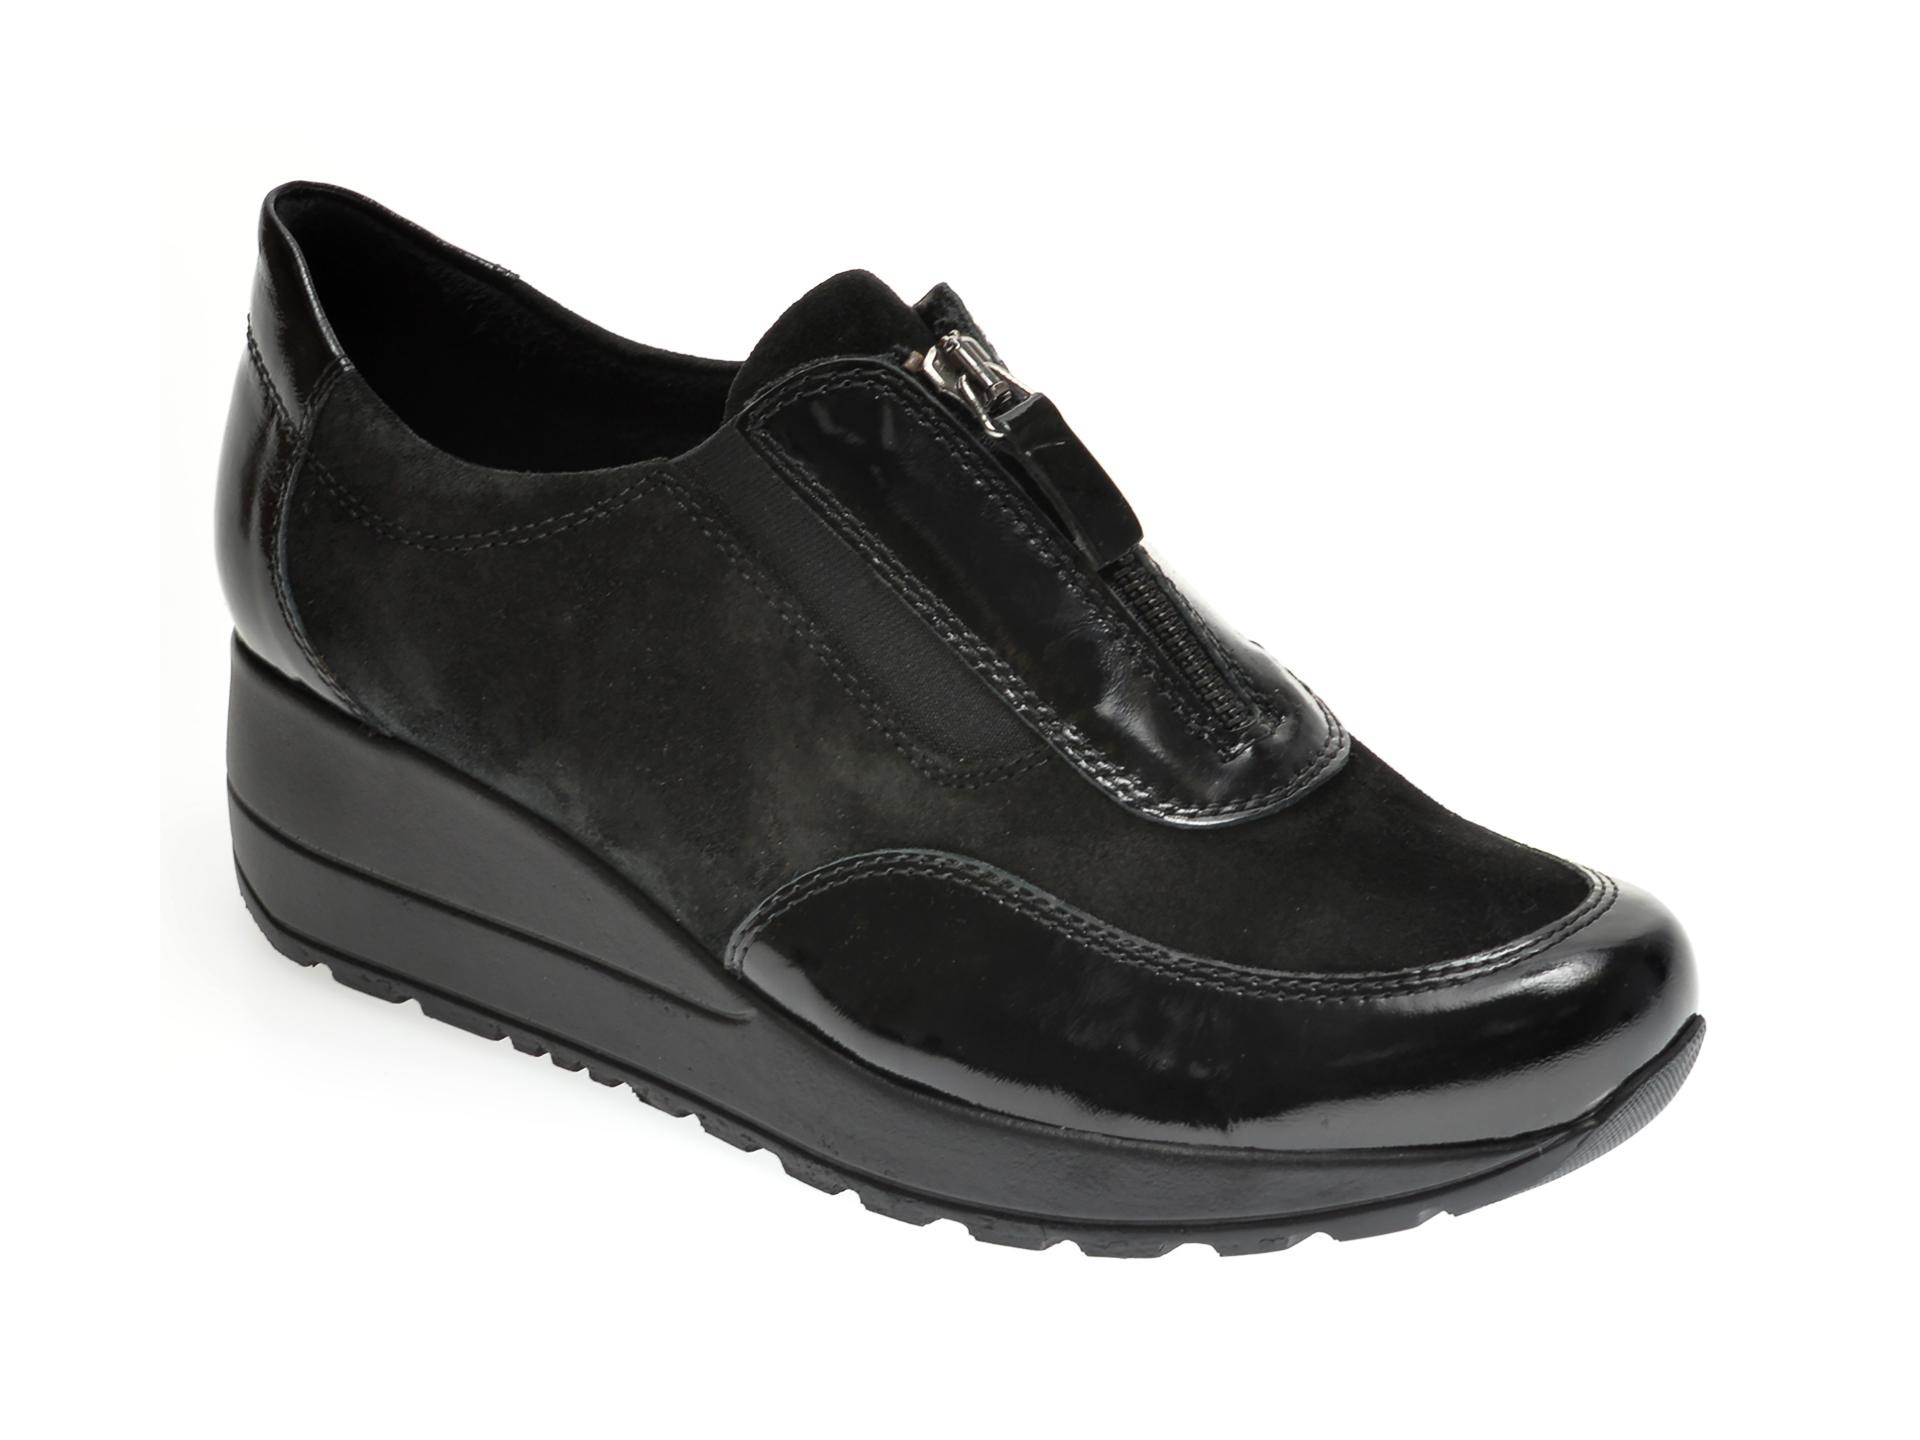 Pantofi ILOZ negri, 5097, din piele naturala lacuita imagine